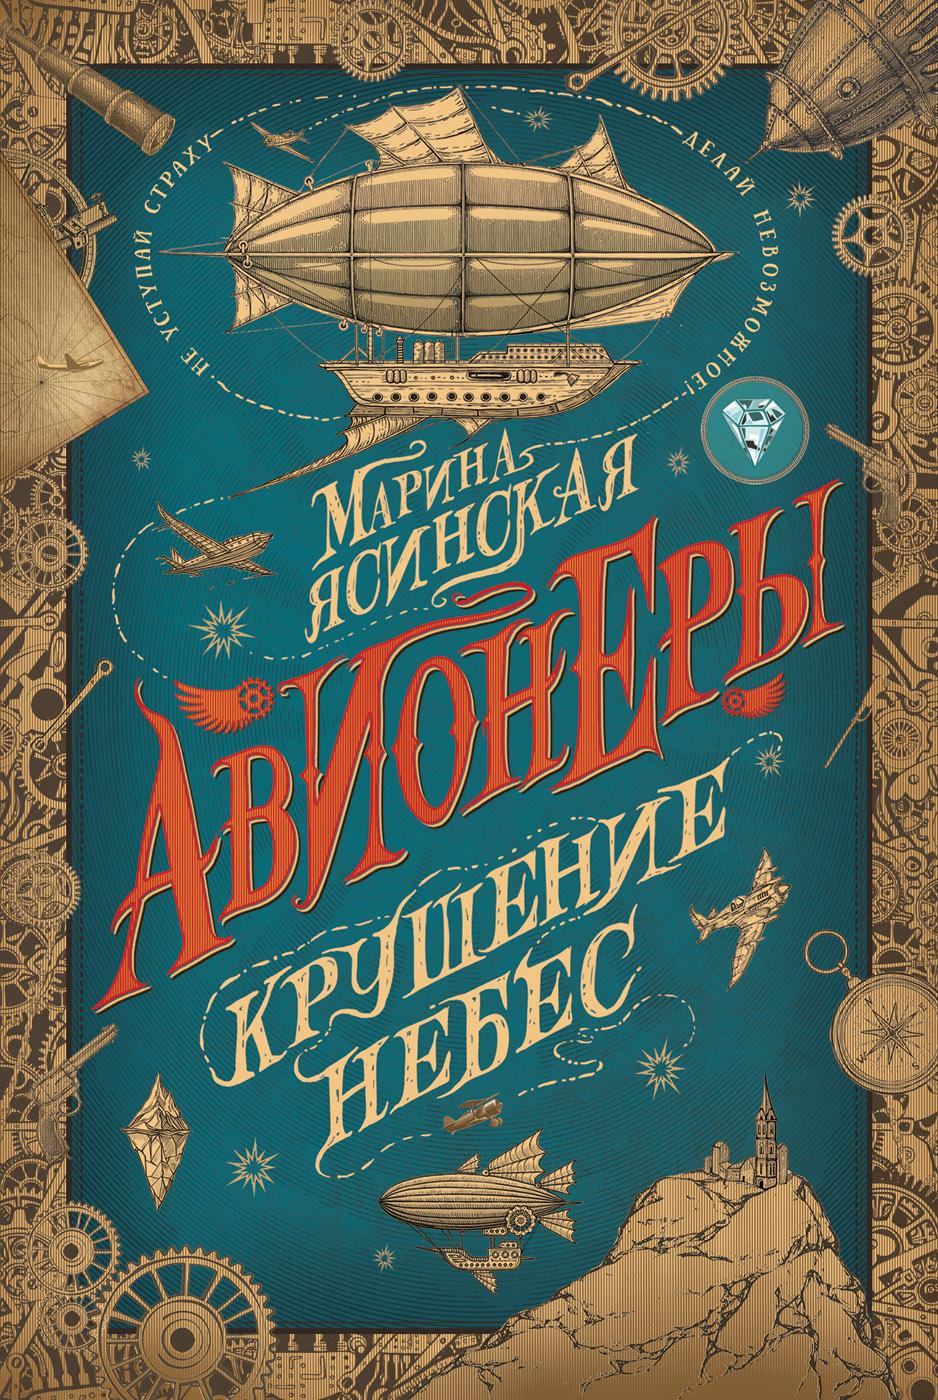 Jasinskaja M. Avionery. 2. Krushenie nebes